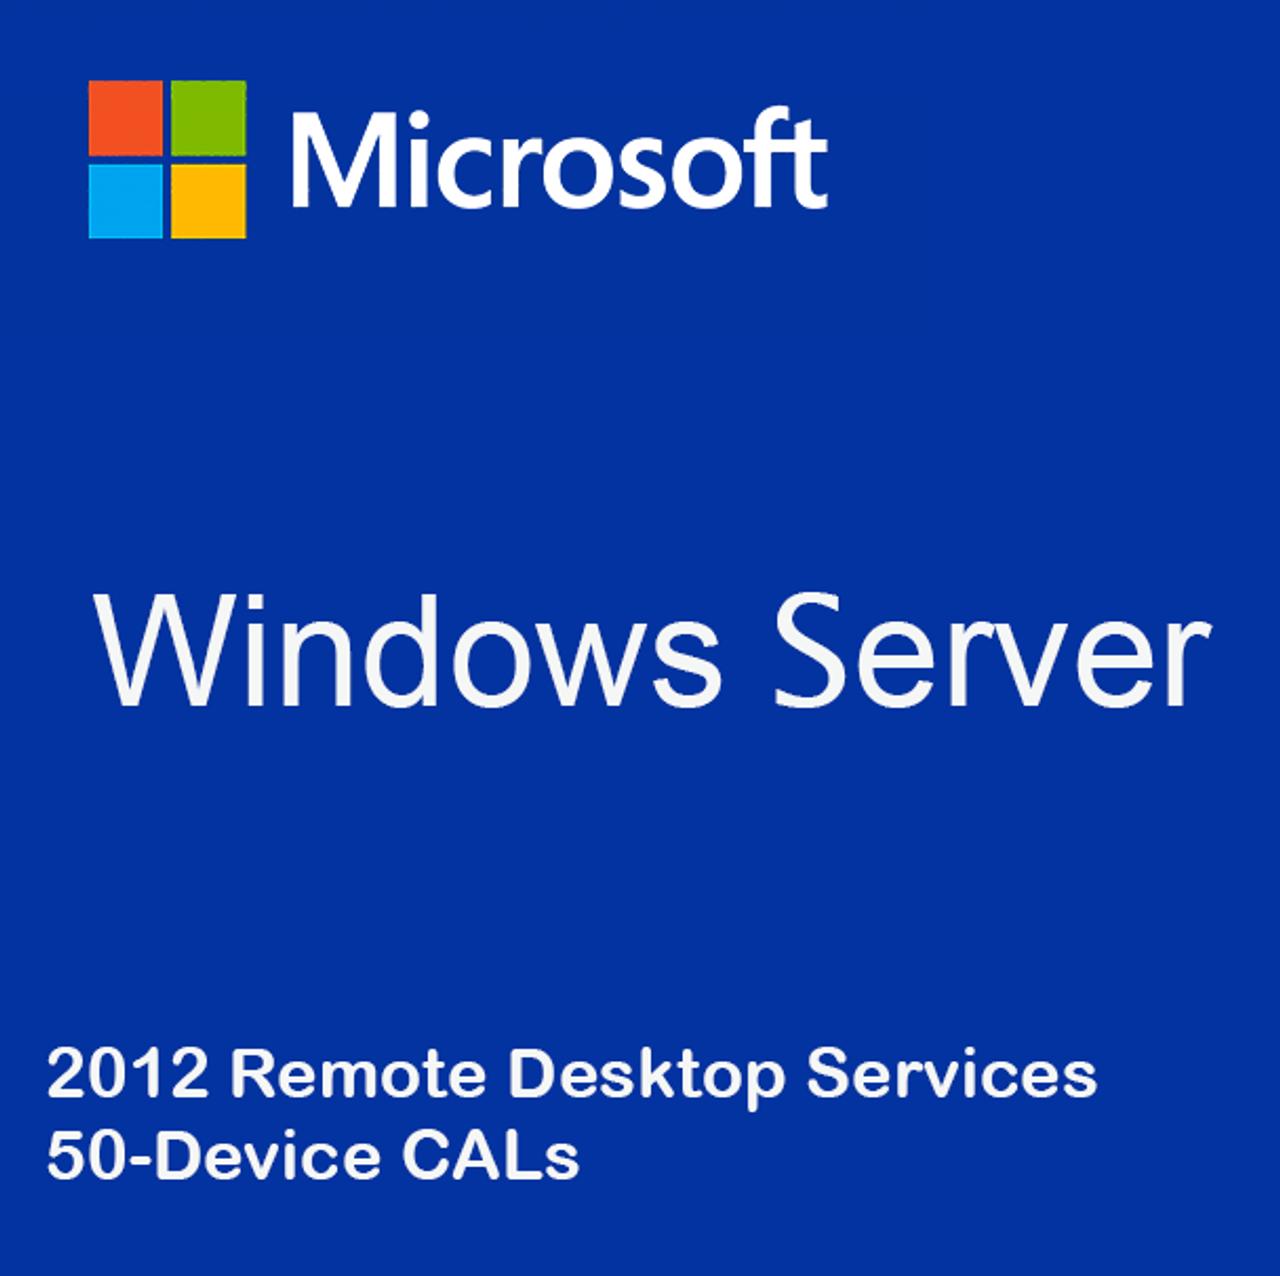 Windows Server 2012 R2 Remote Desktop Services Per-Device CALs